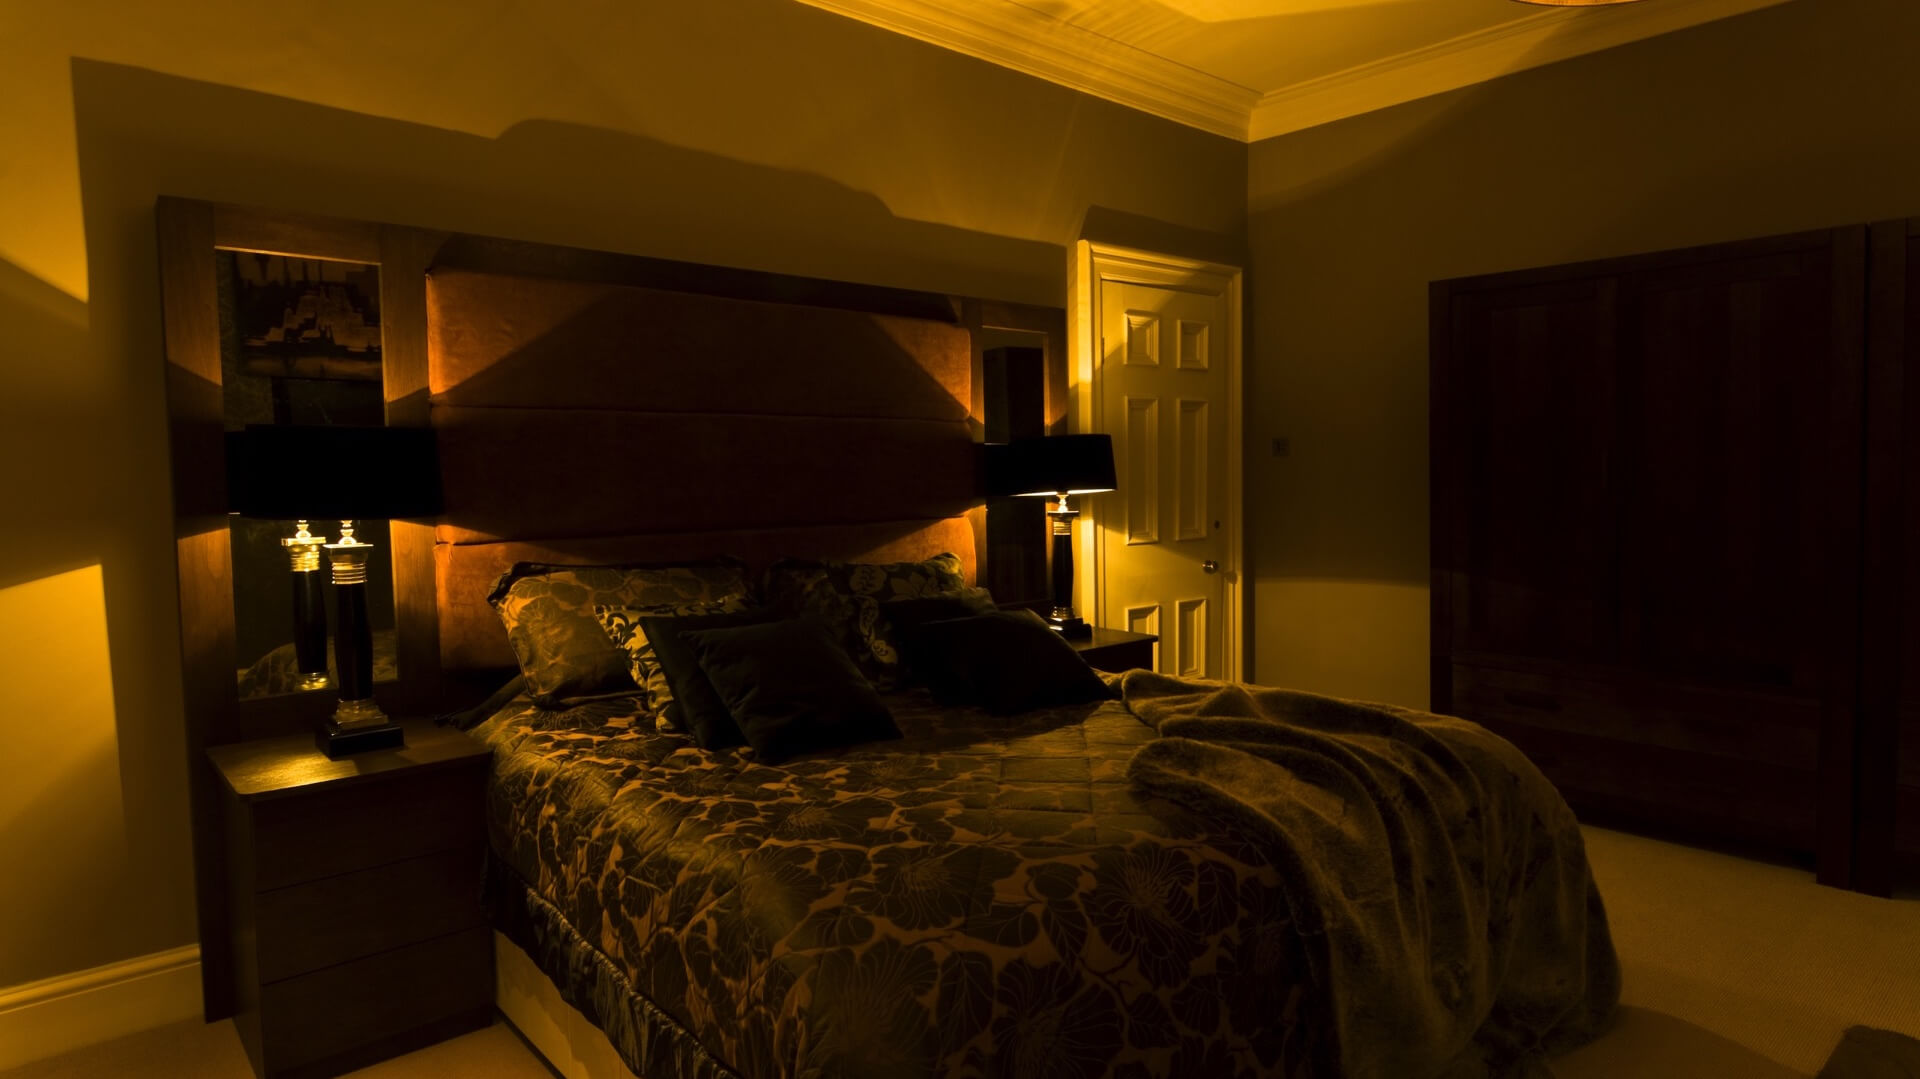 best mood lighting for bedroom